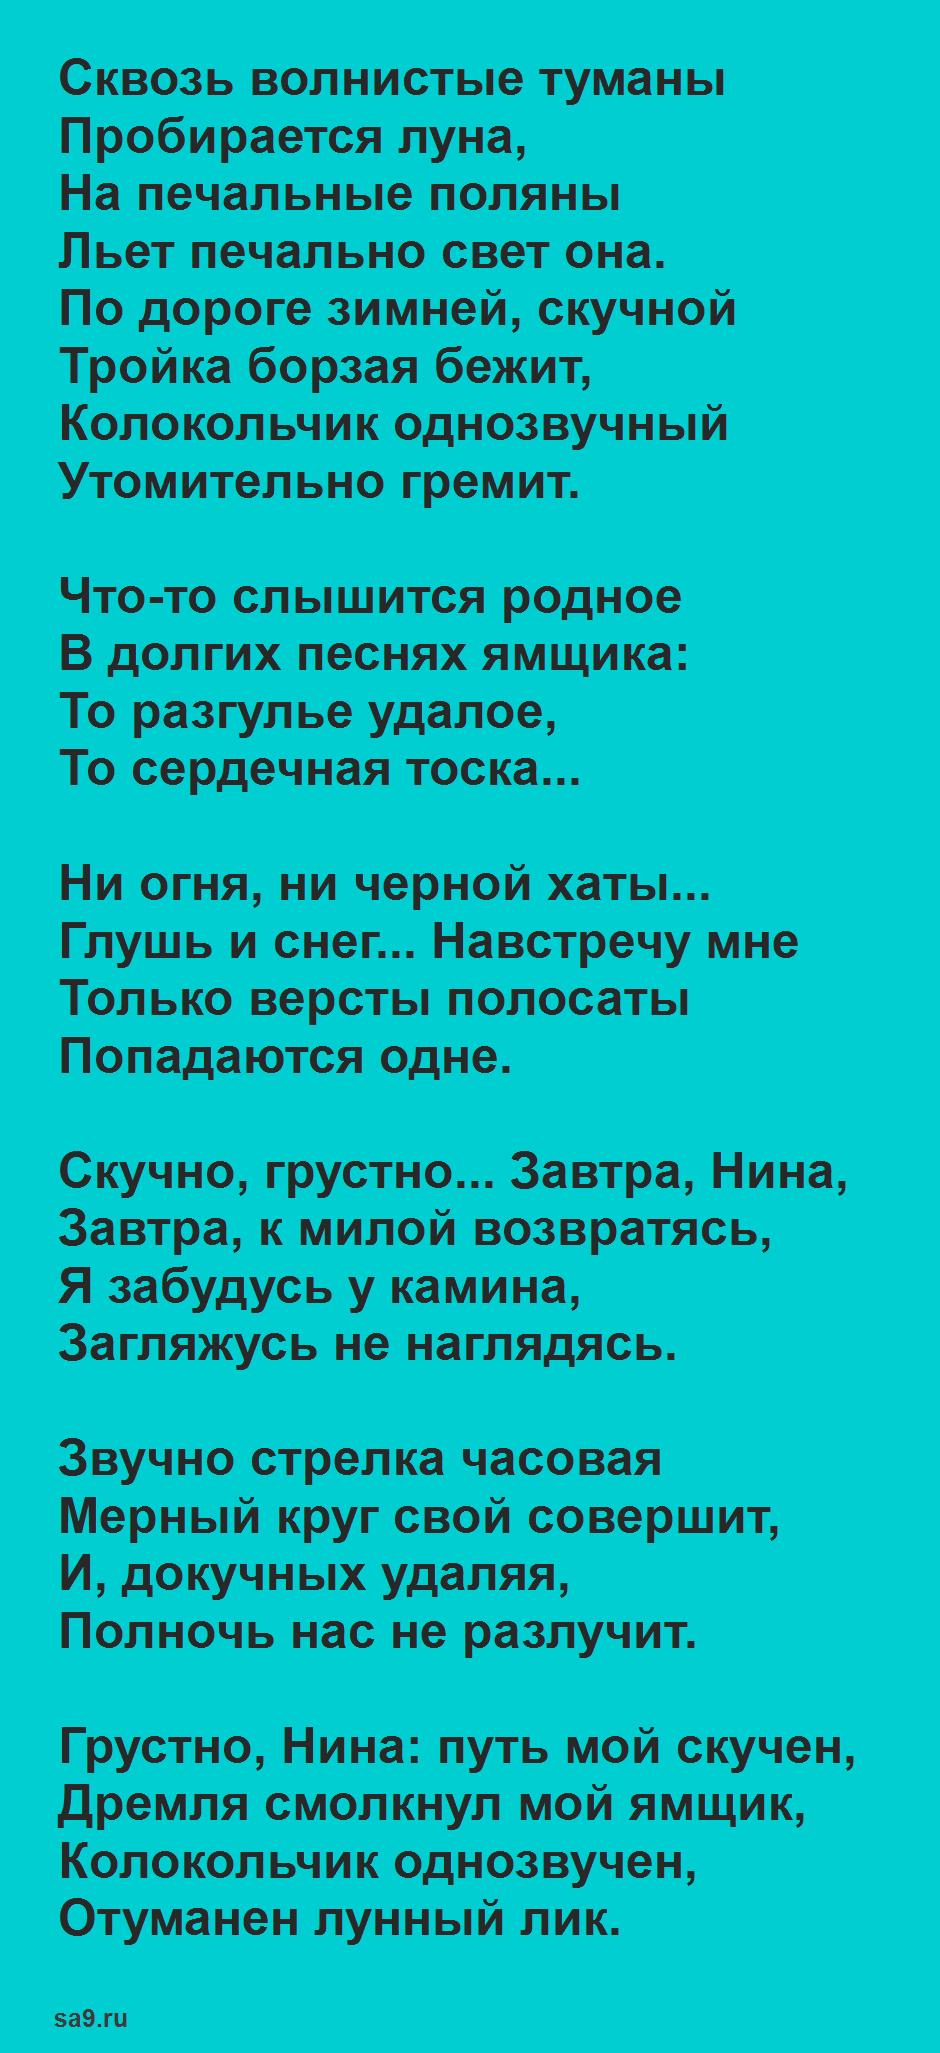 Зимние стихи Пушкина - Зимняя дорога